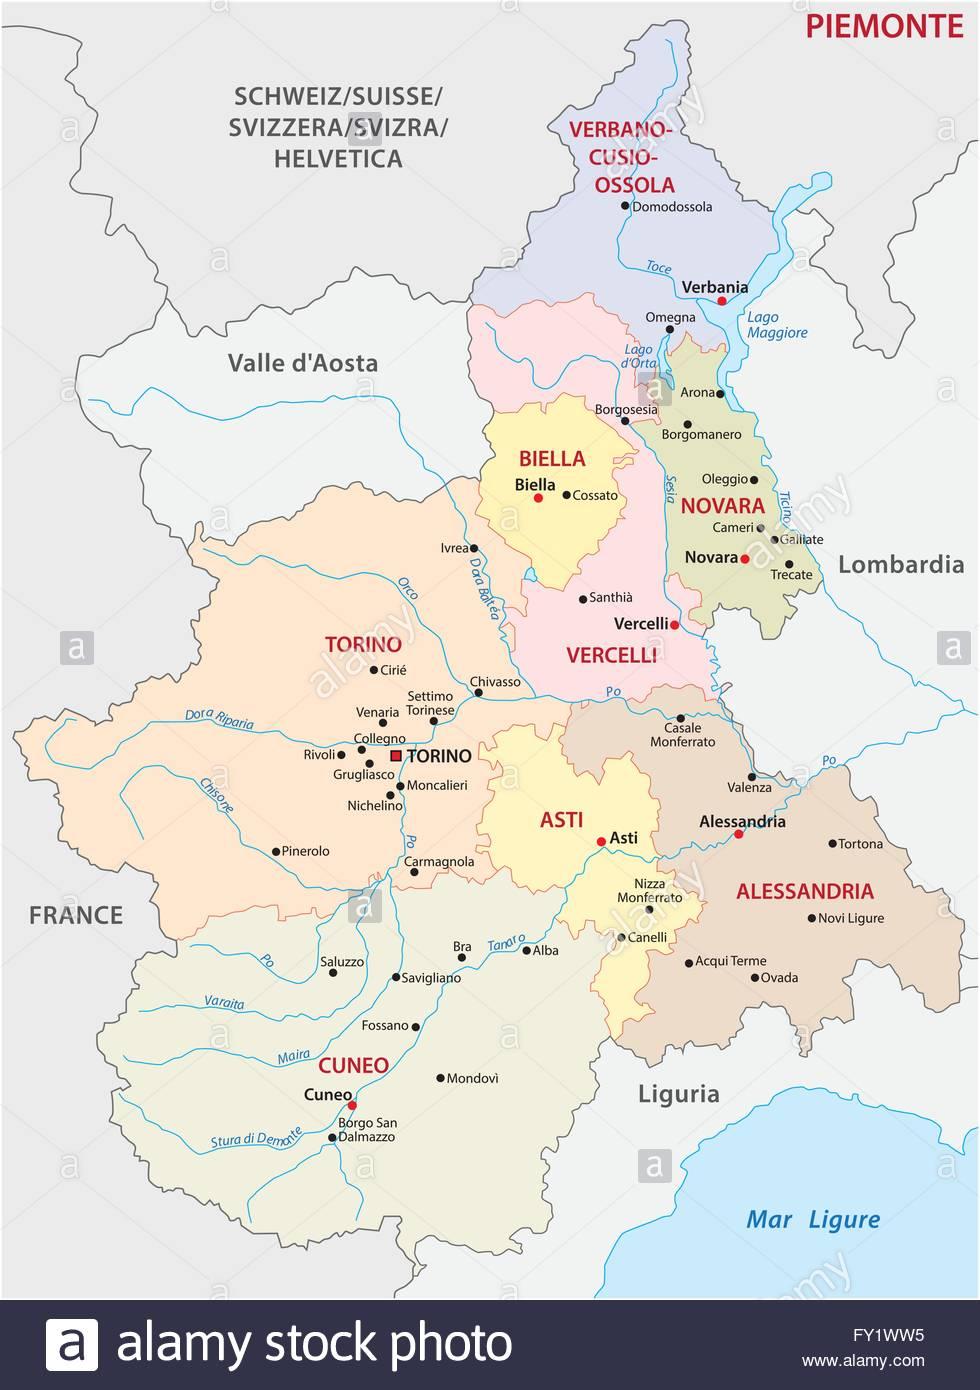 piedmont-administrative-map-italy-FY1WW5.jpg